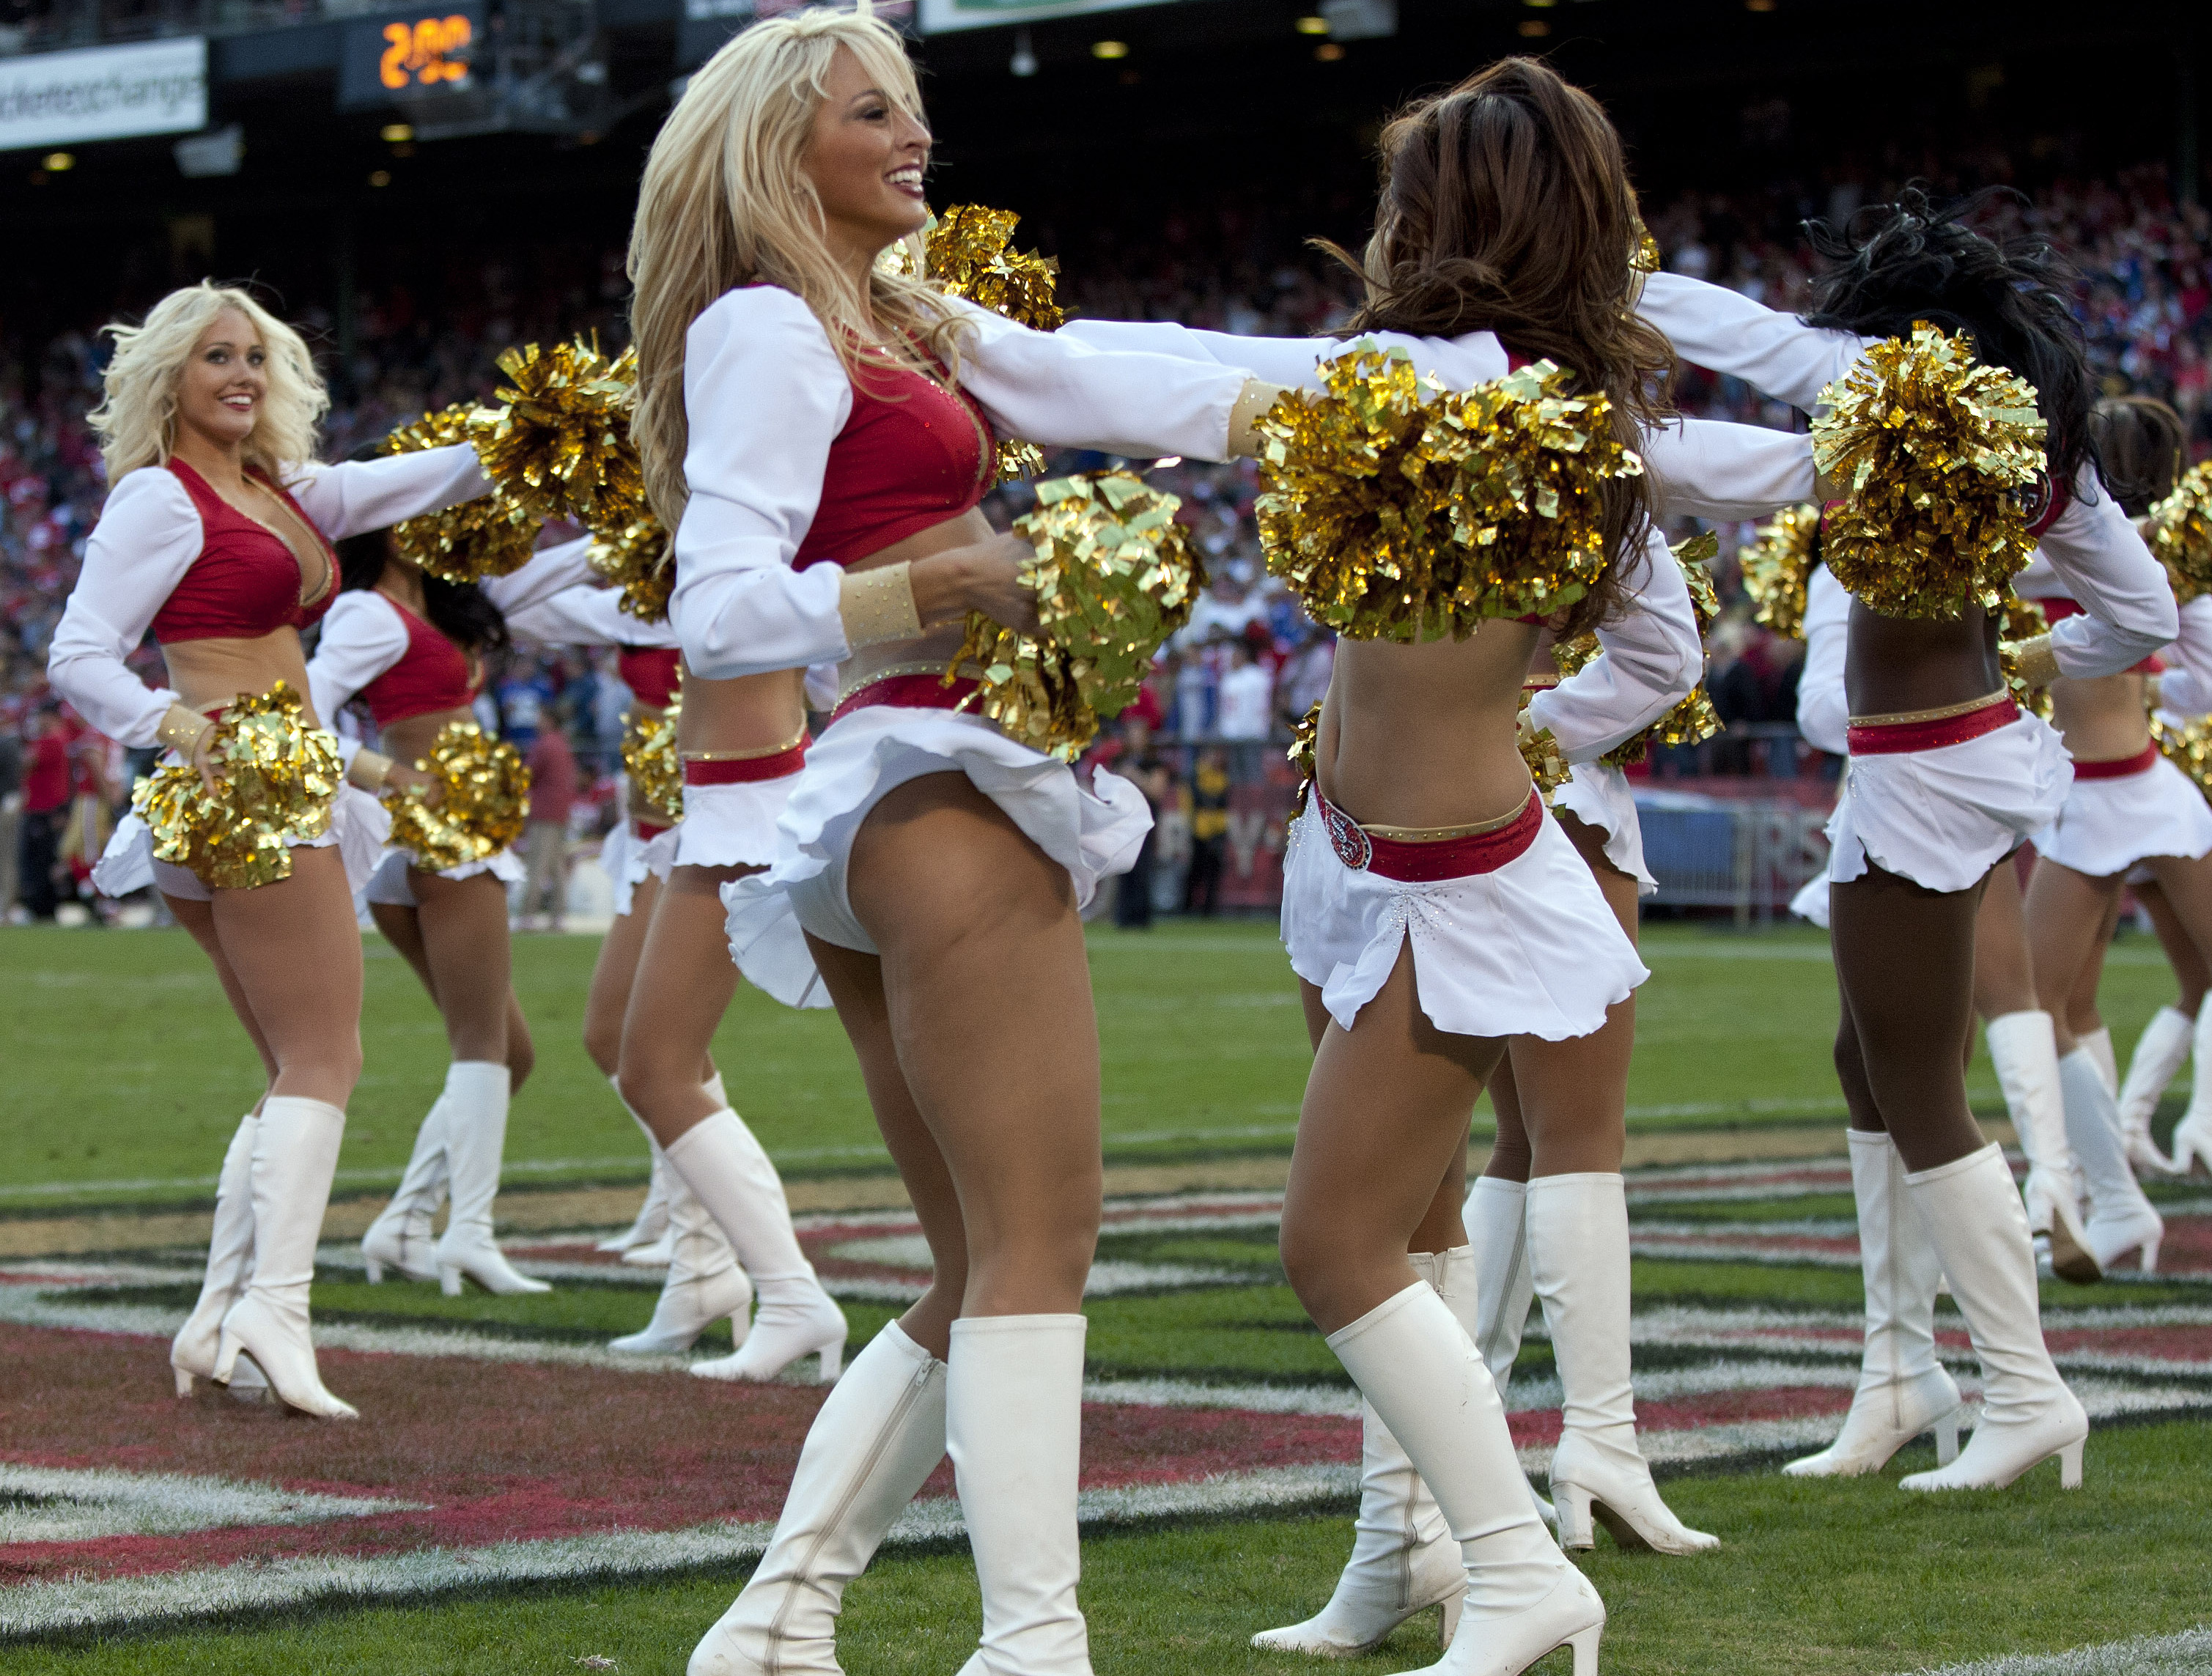 Lizleanna high school cheerleader